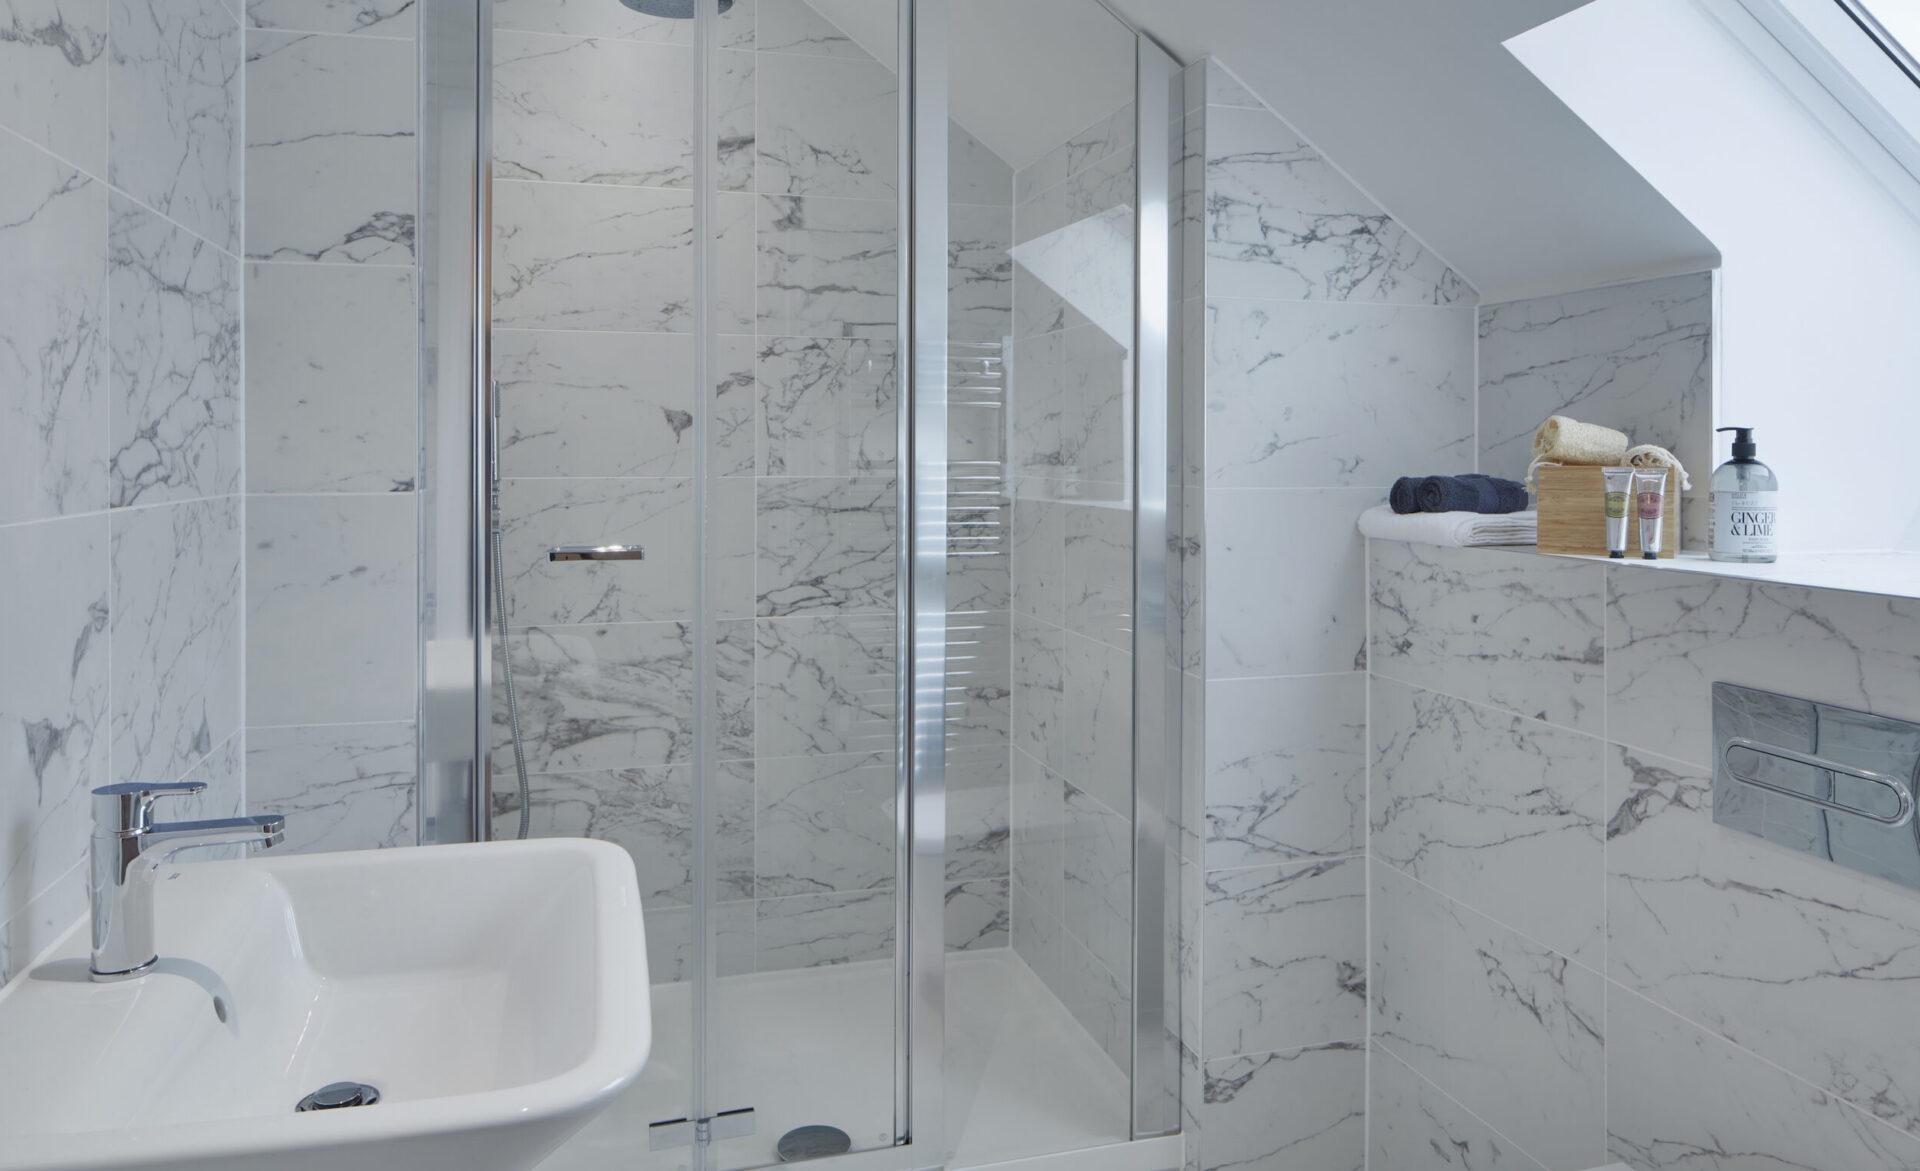 Lakside bathroom